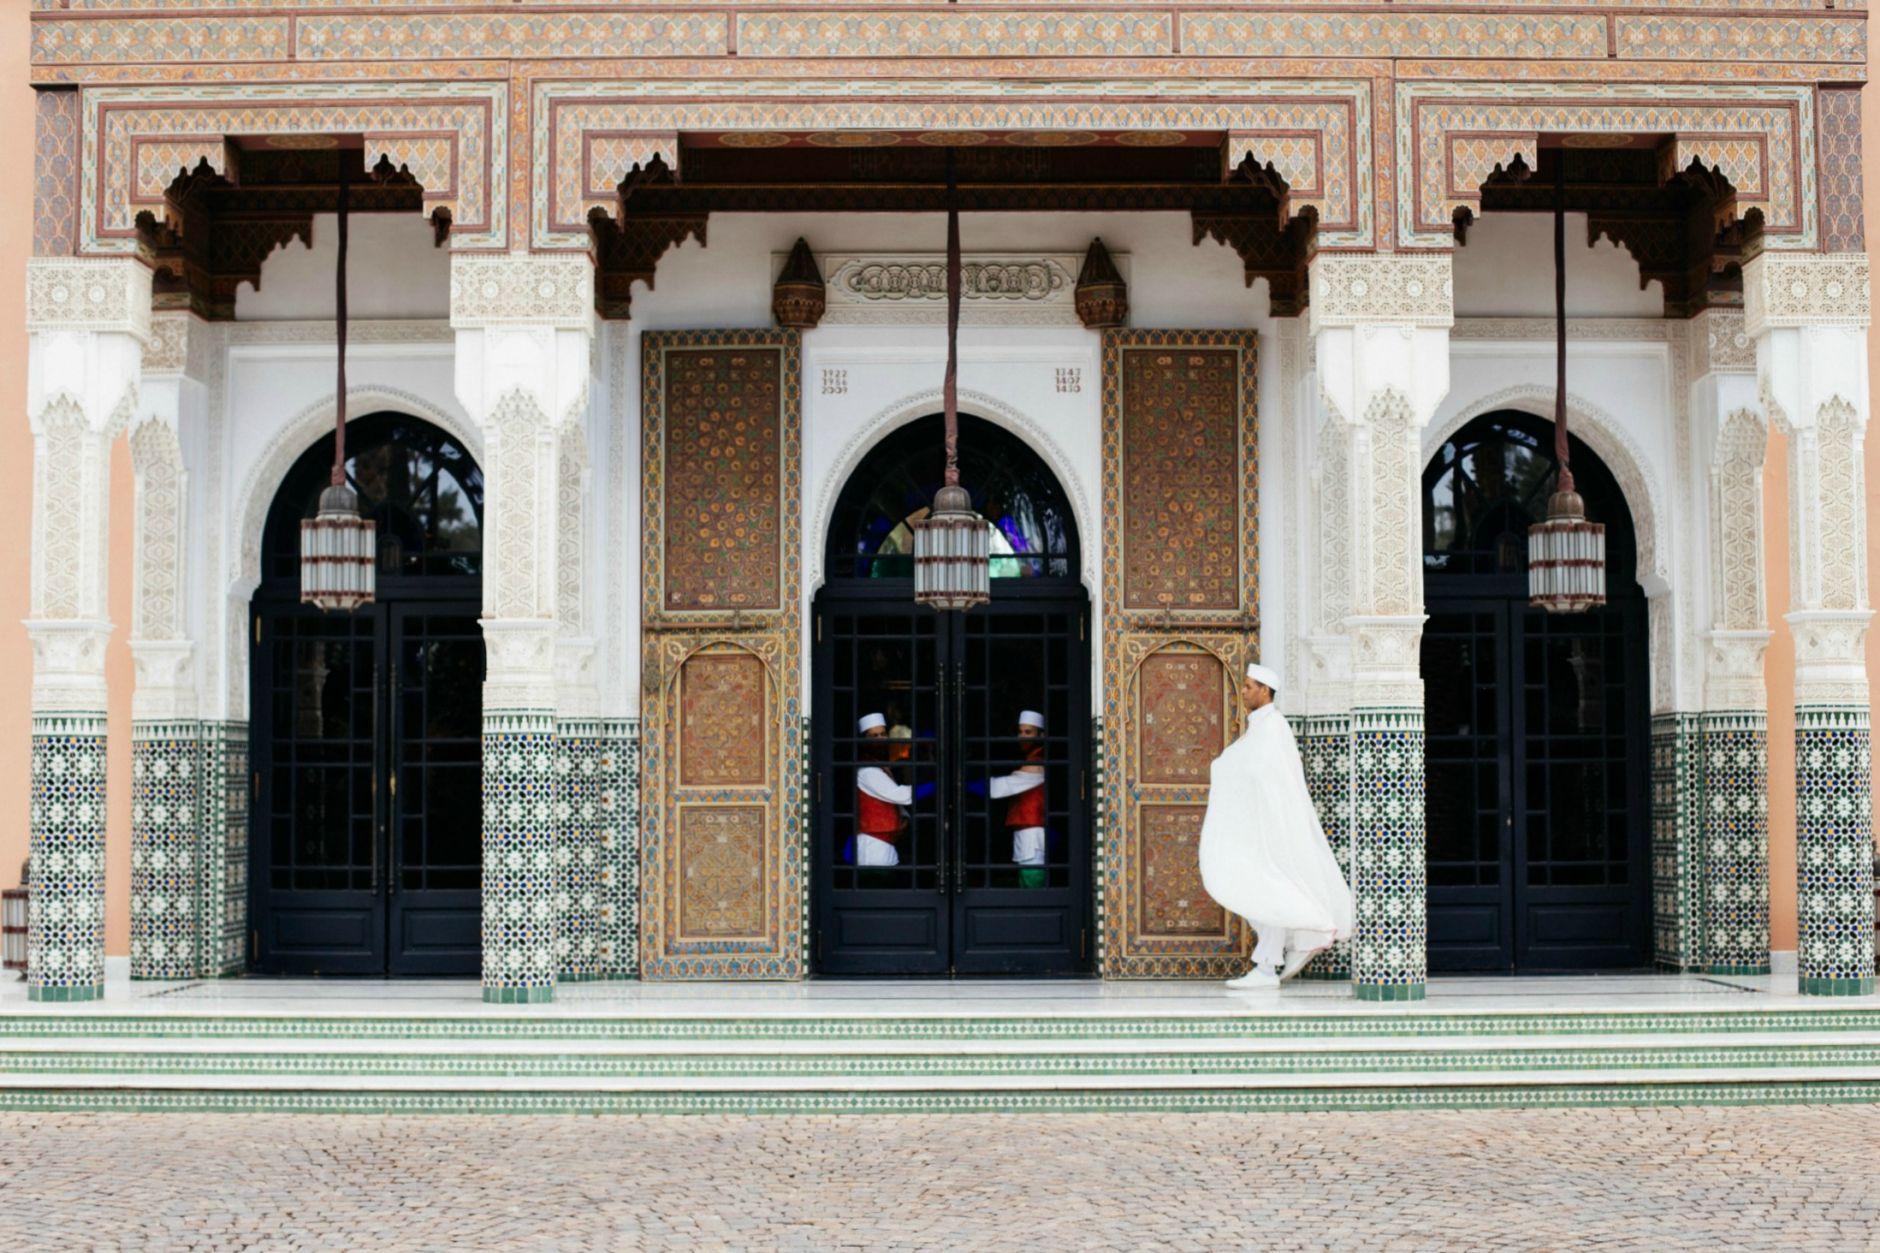 palace-in-marrakesh-morocco-la-mamounia-5-star-luxury-hotel-spa-14